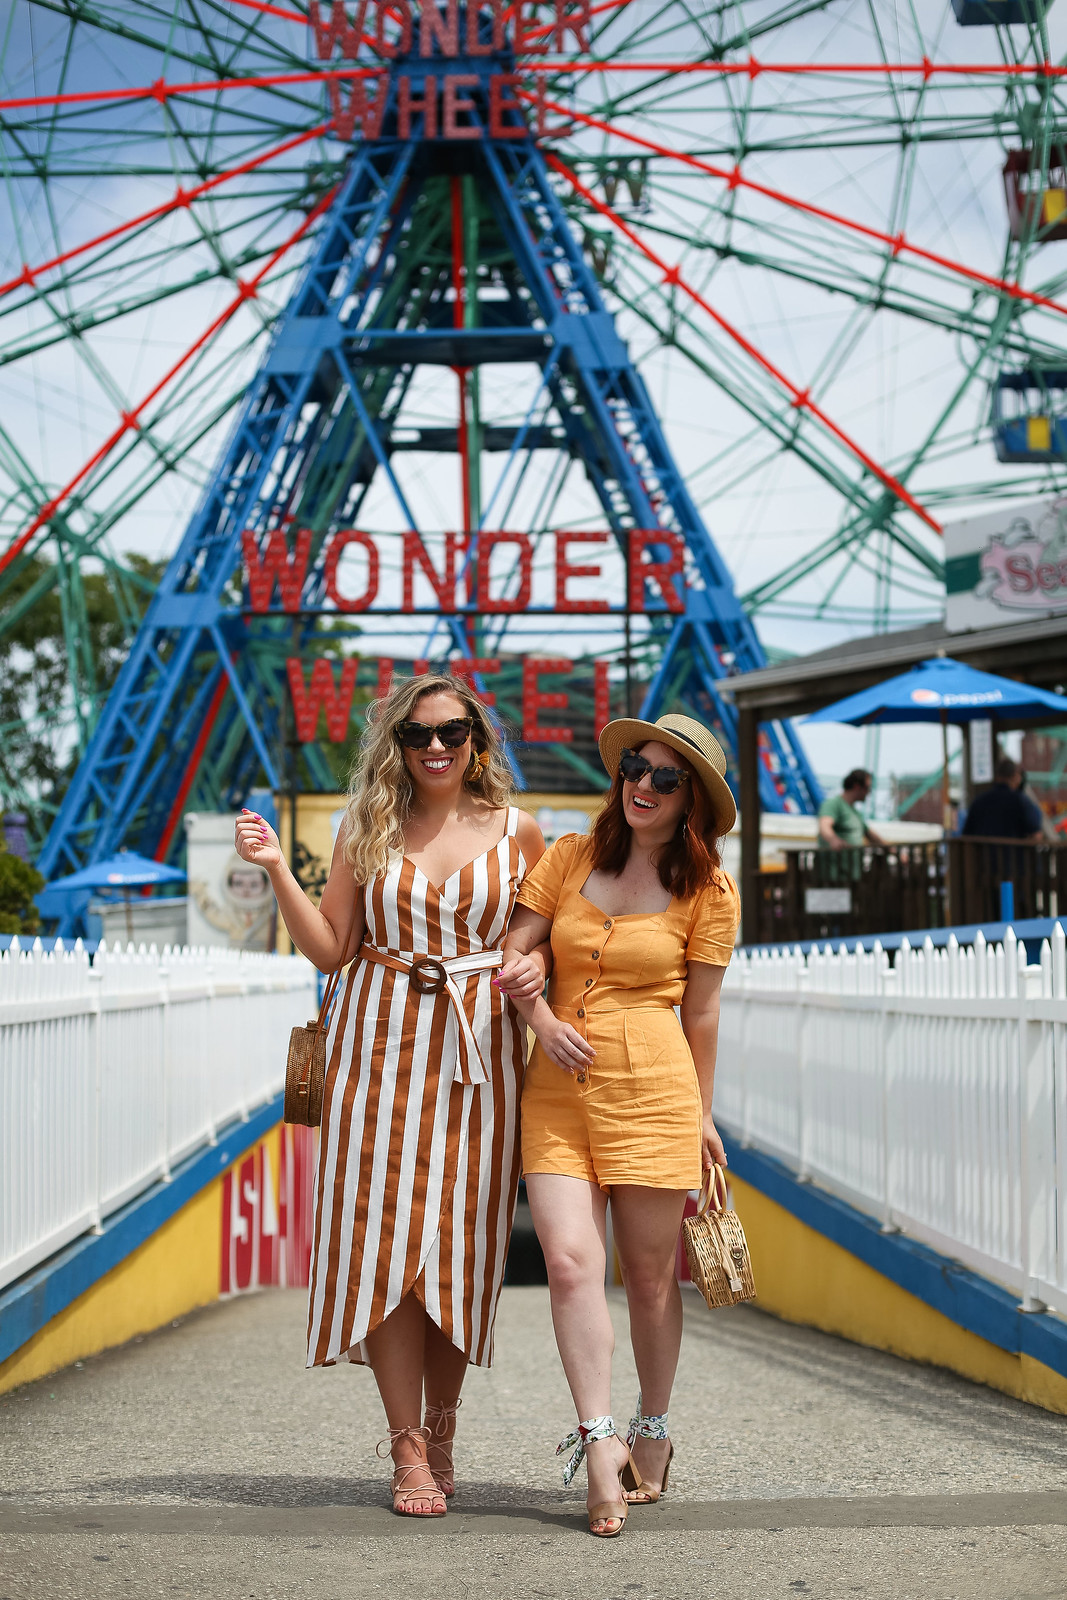 Vintage Inspired Summer Outfits | Coney Island Brooklyn New York | Coney Island Photoshoot | Wonder Wheel | Amusement Park Photo Ideas | Retro Summer Clothes